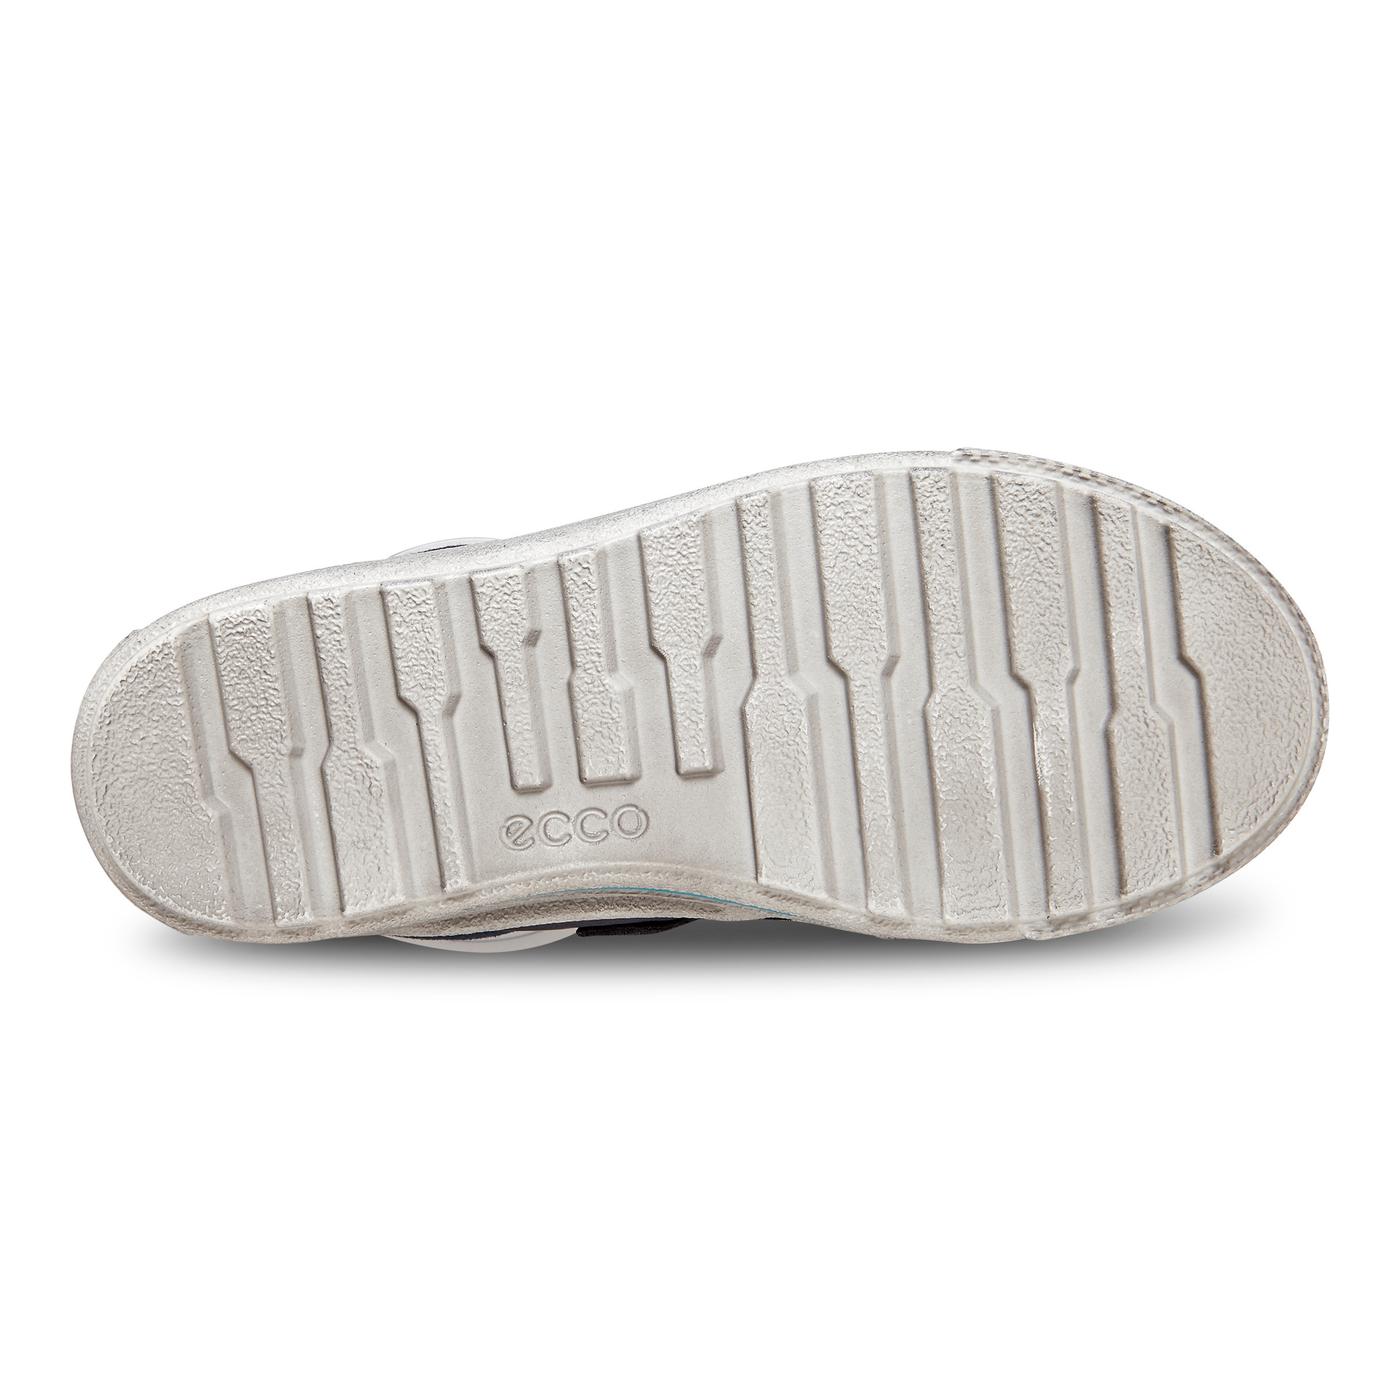 ECCO Glyder Strap Sneaker